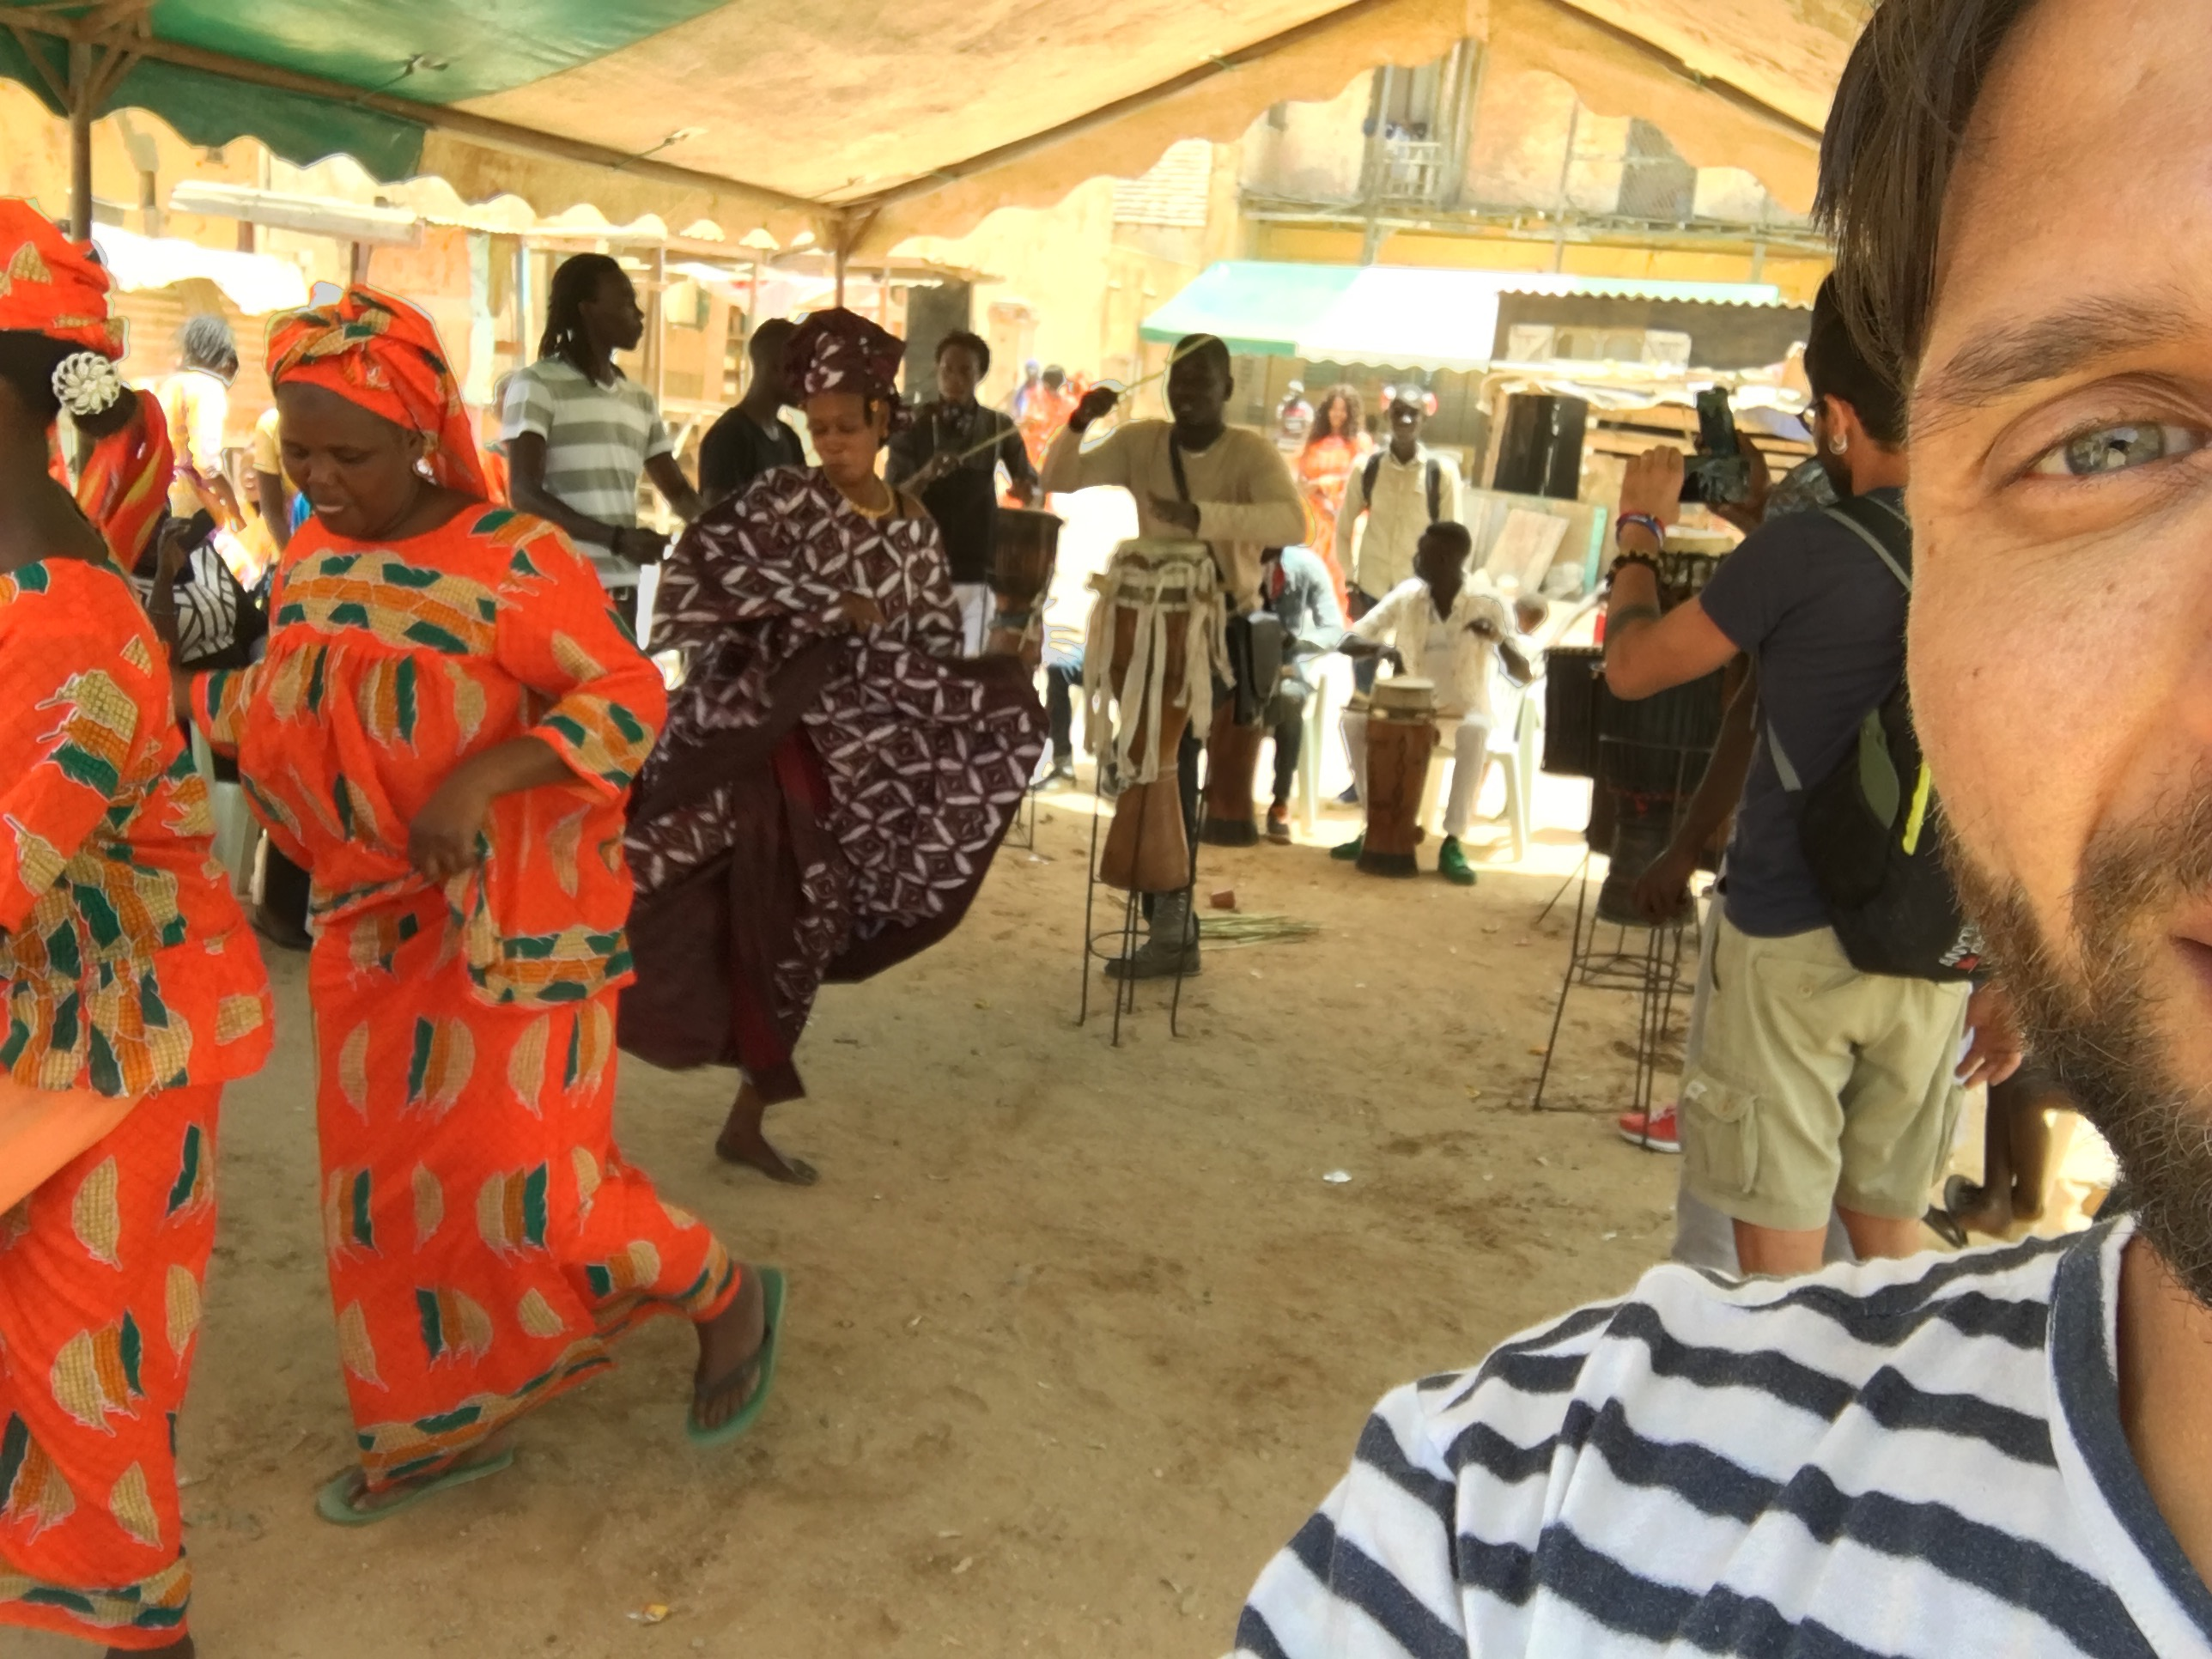 Festa senegalese